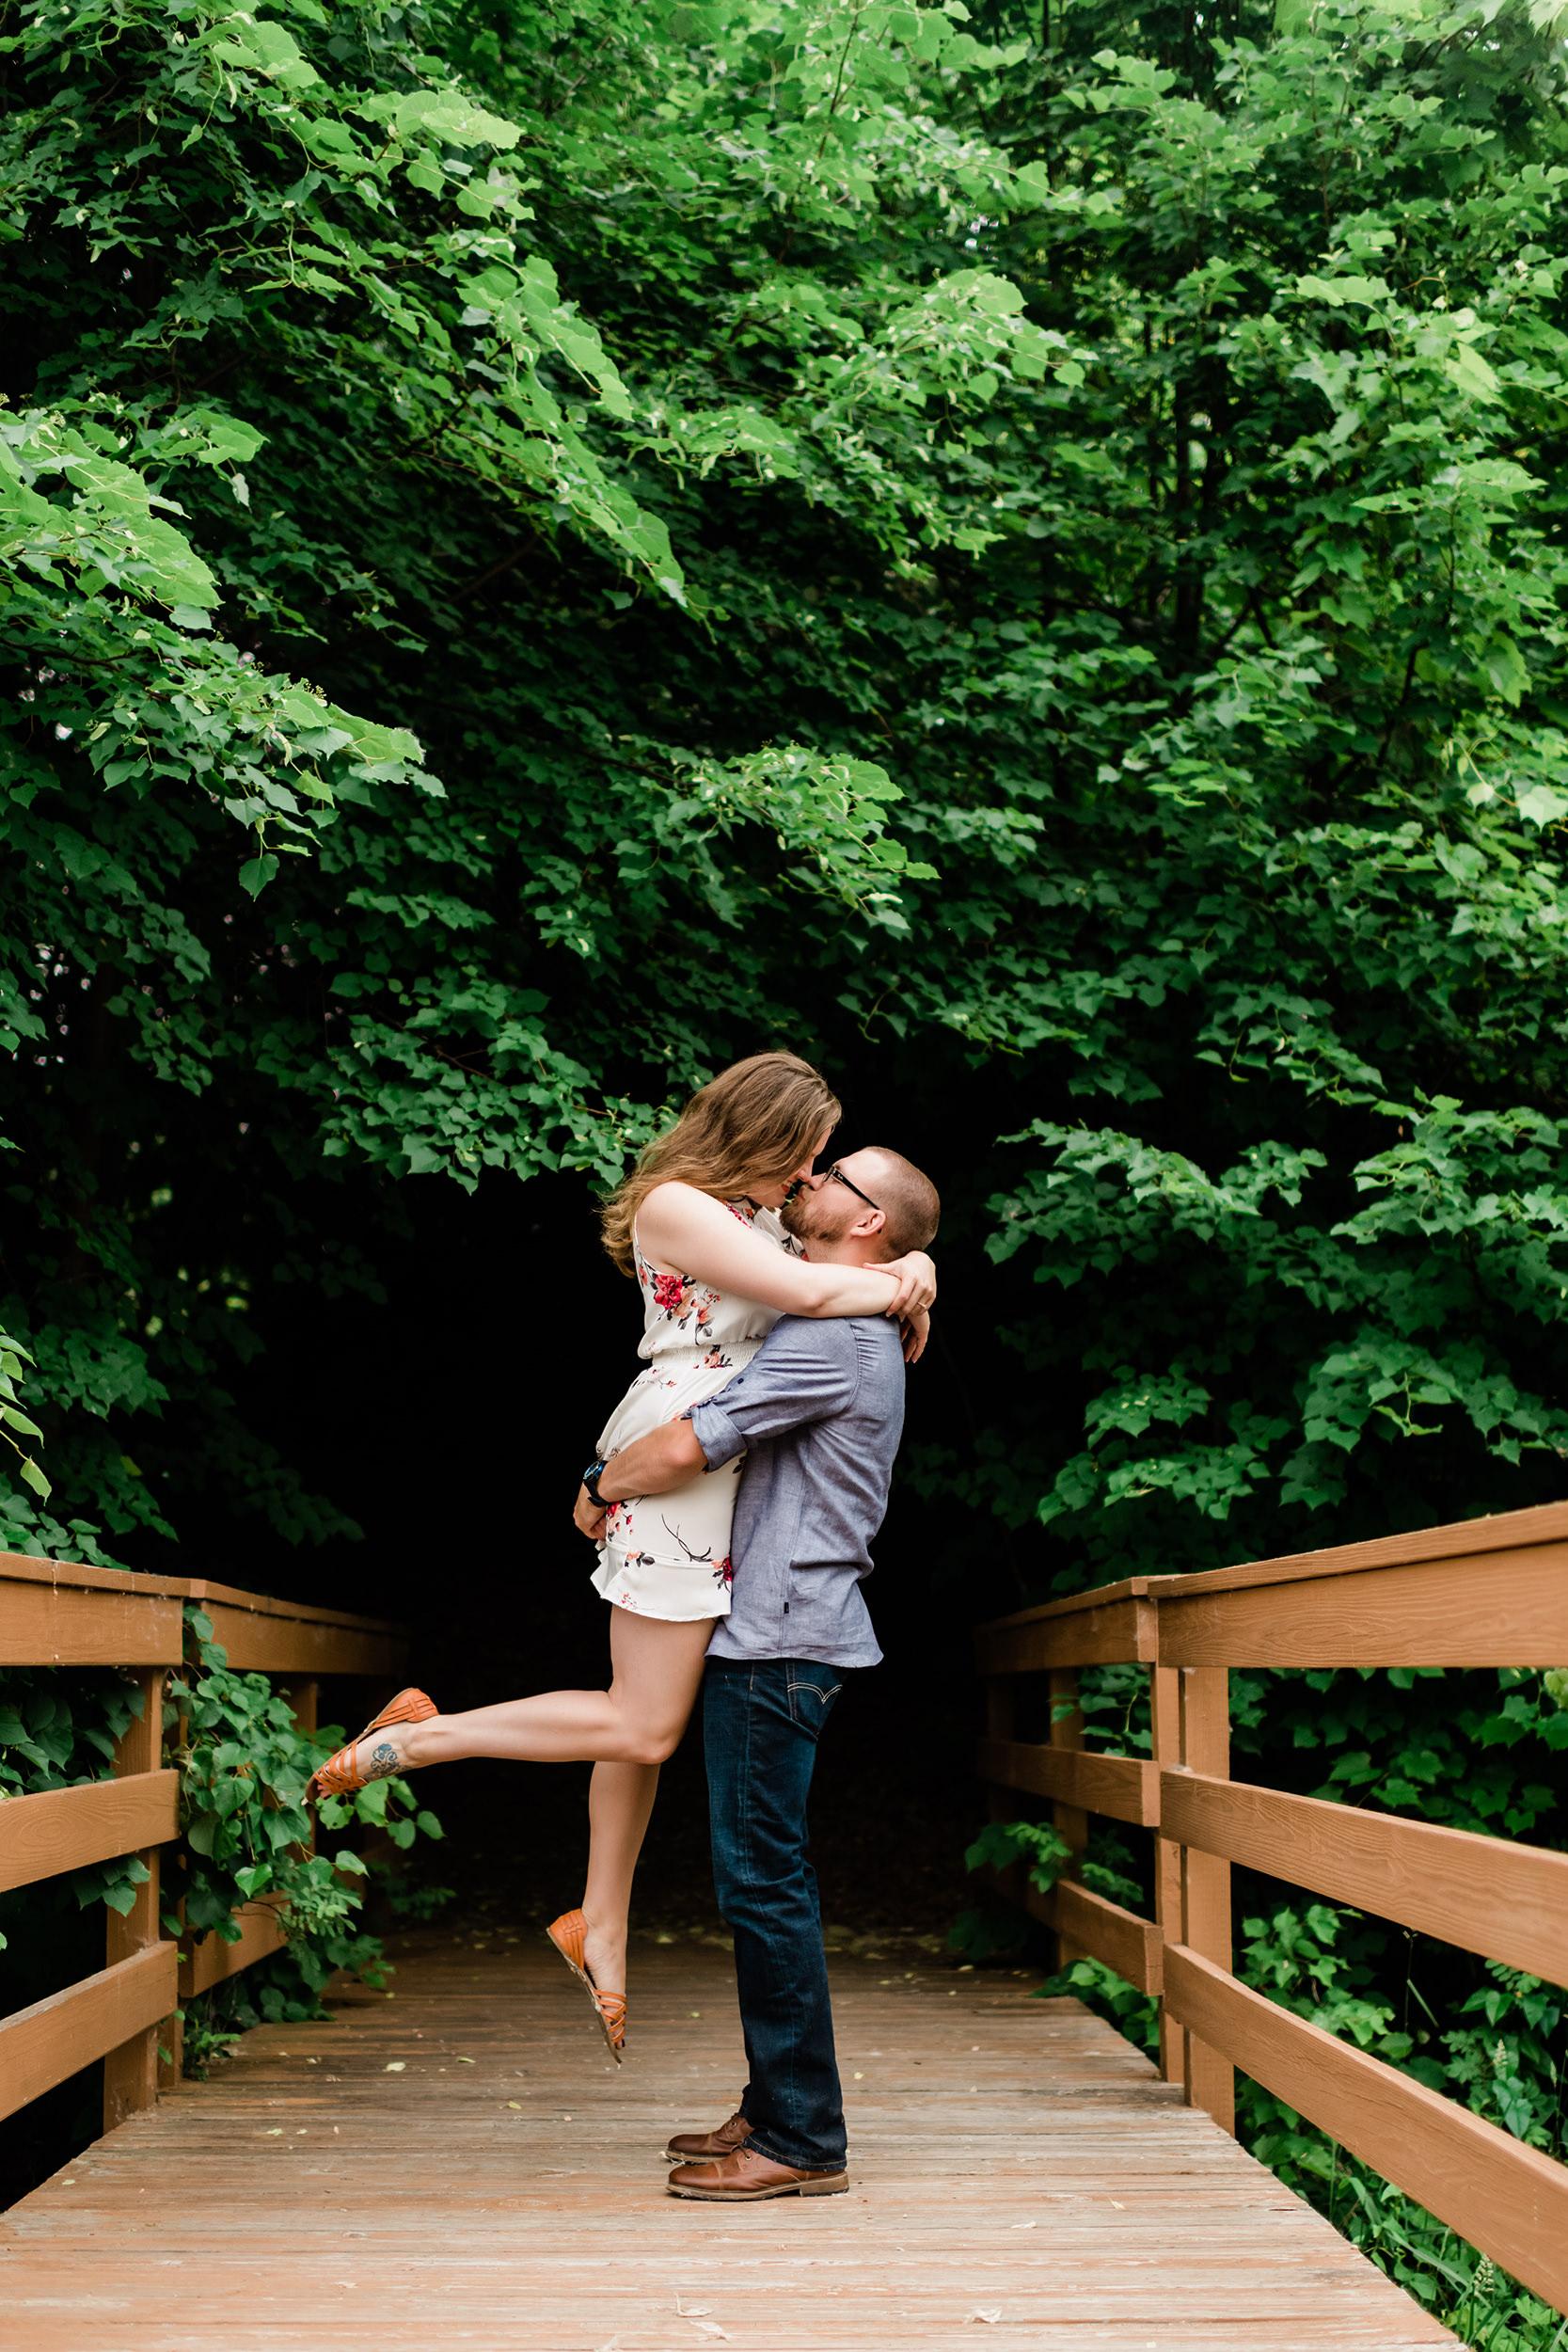 Man picks up his fiancé as she kisses him